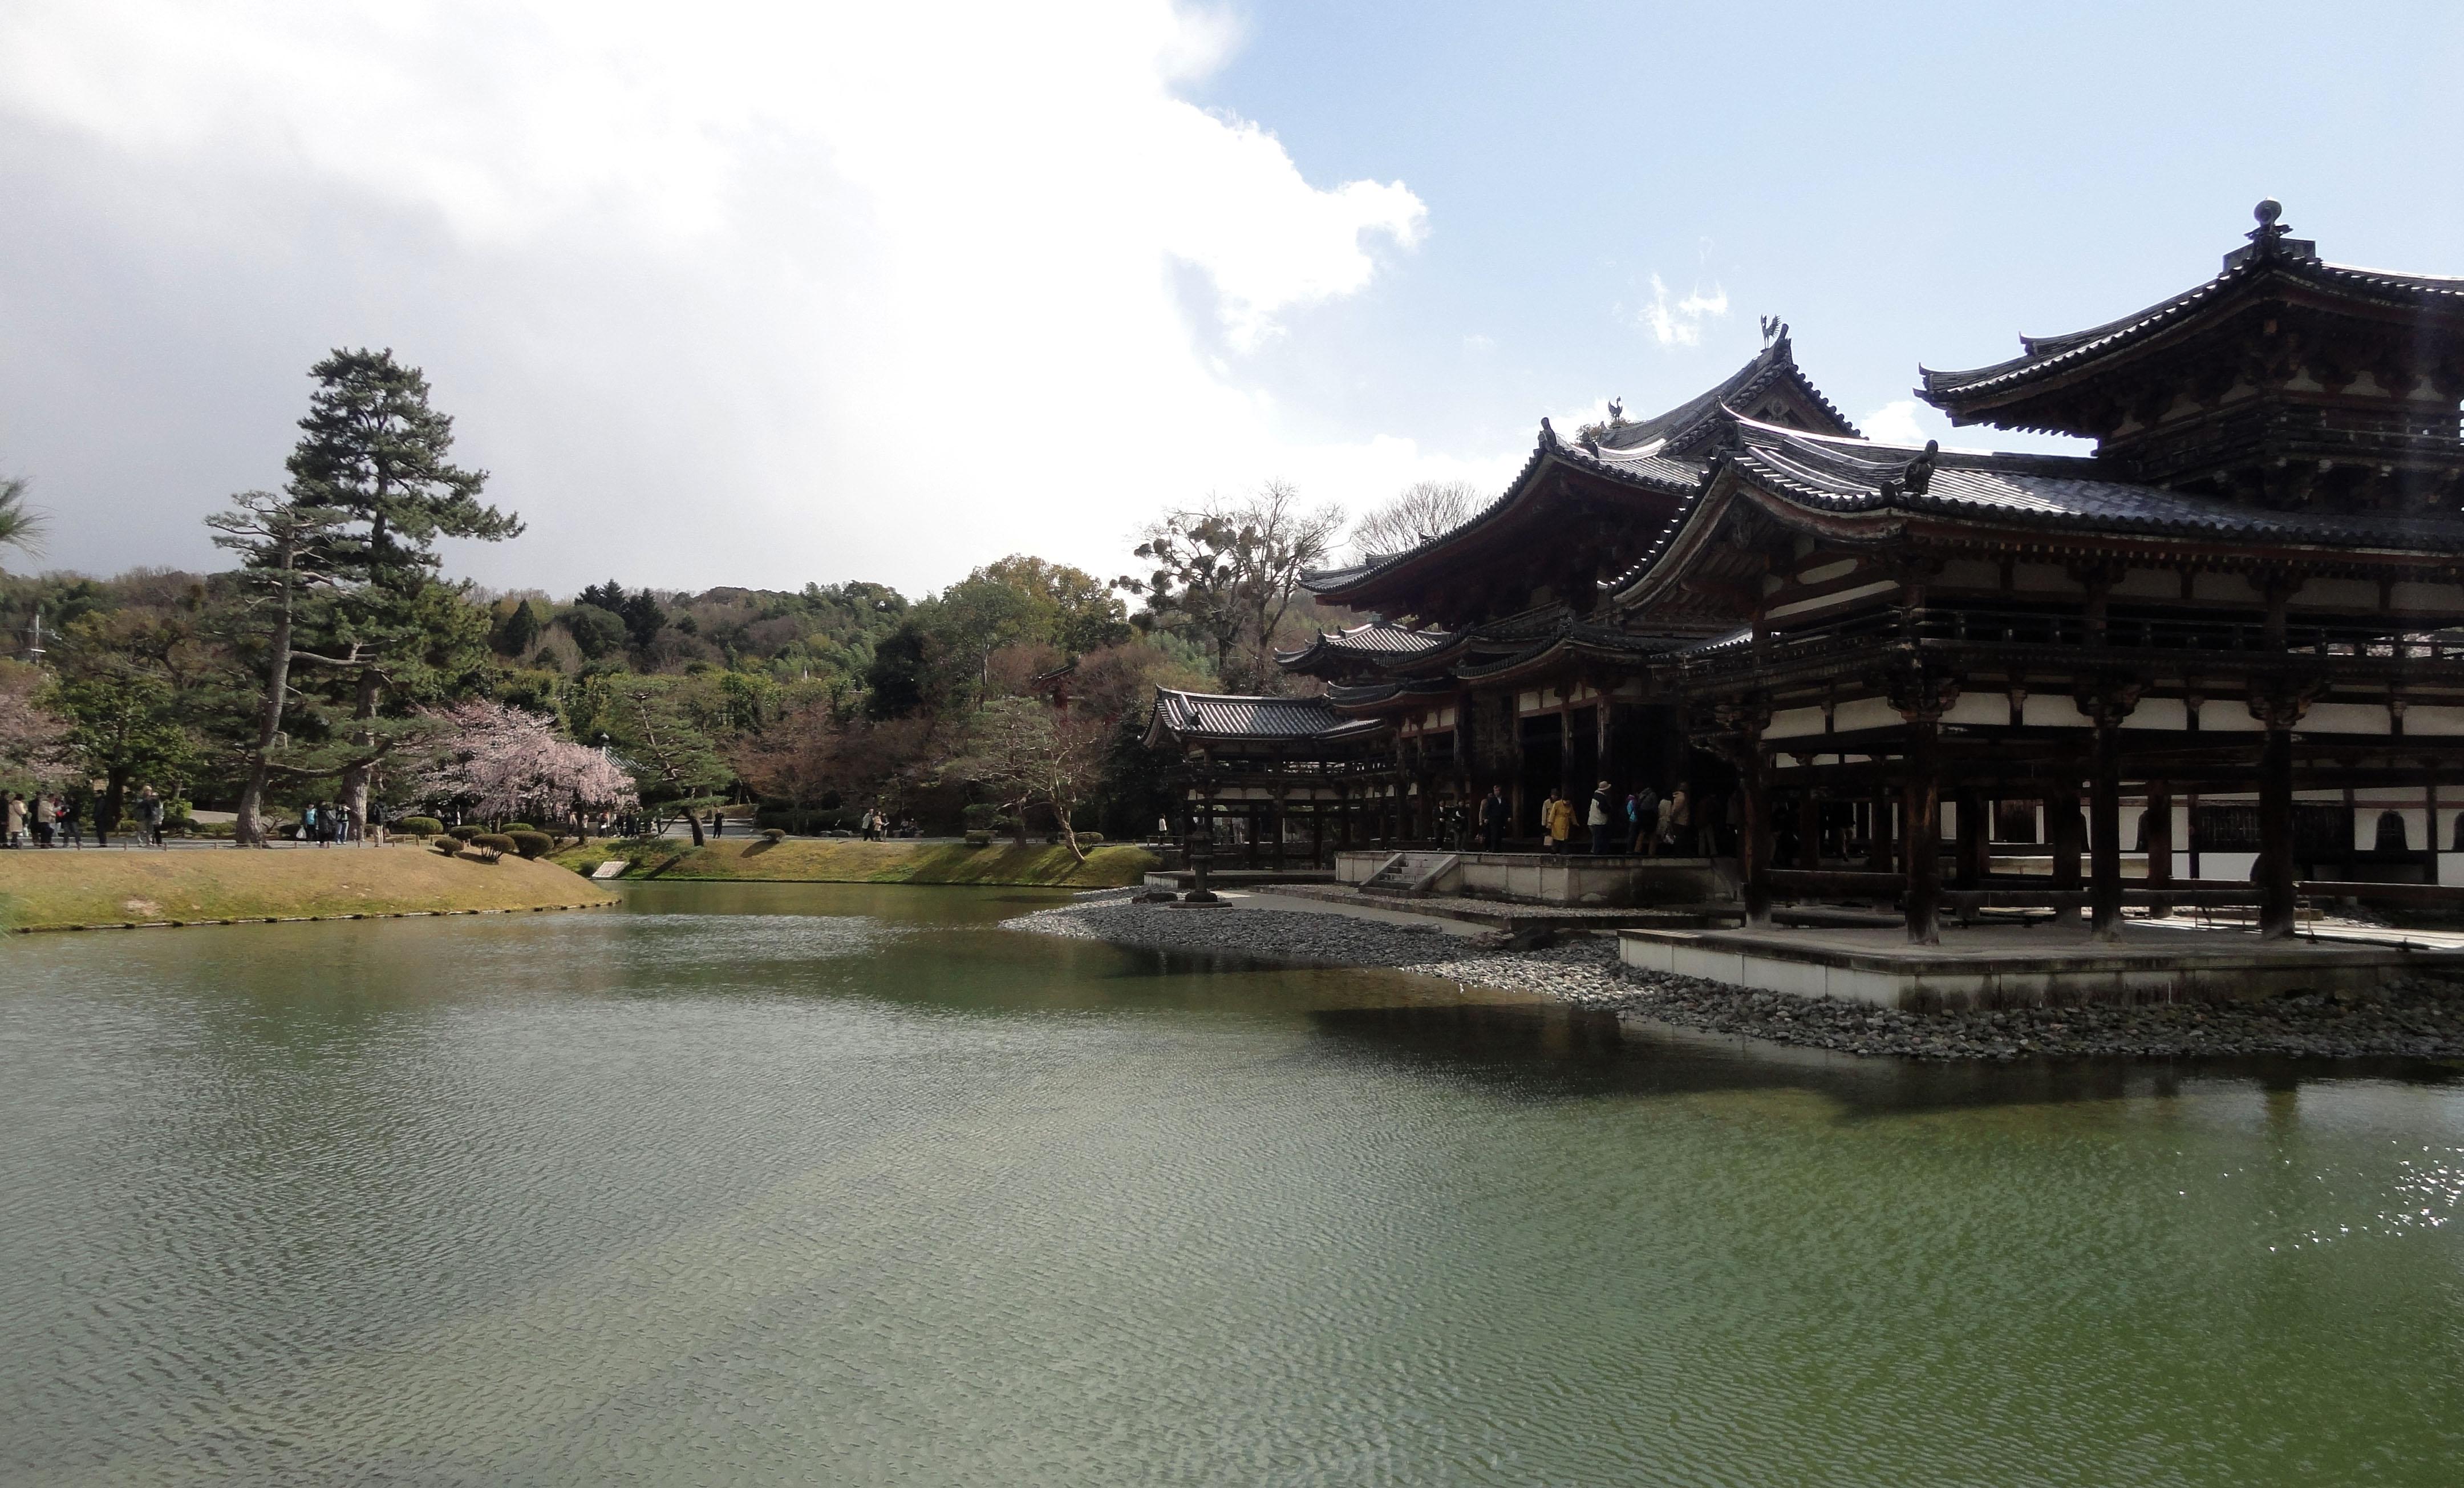 Byodo in temple Phoenix Hall Jodo shiki garden pond Kyoto Japan 01